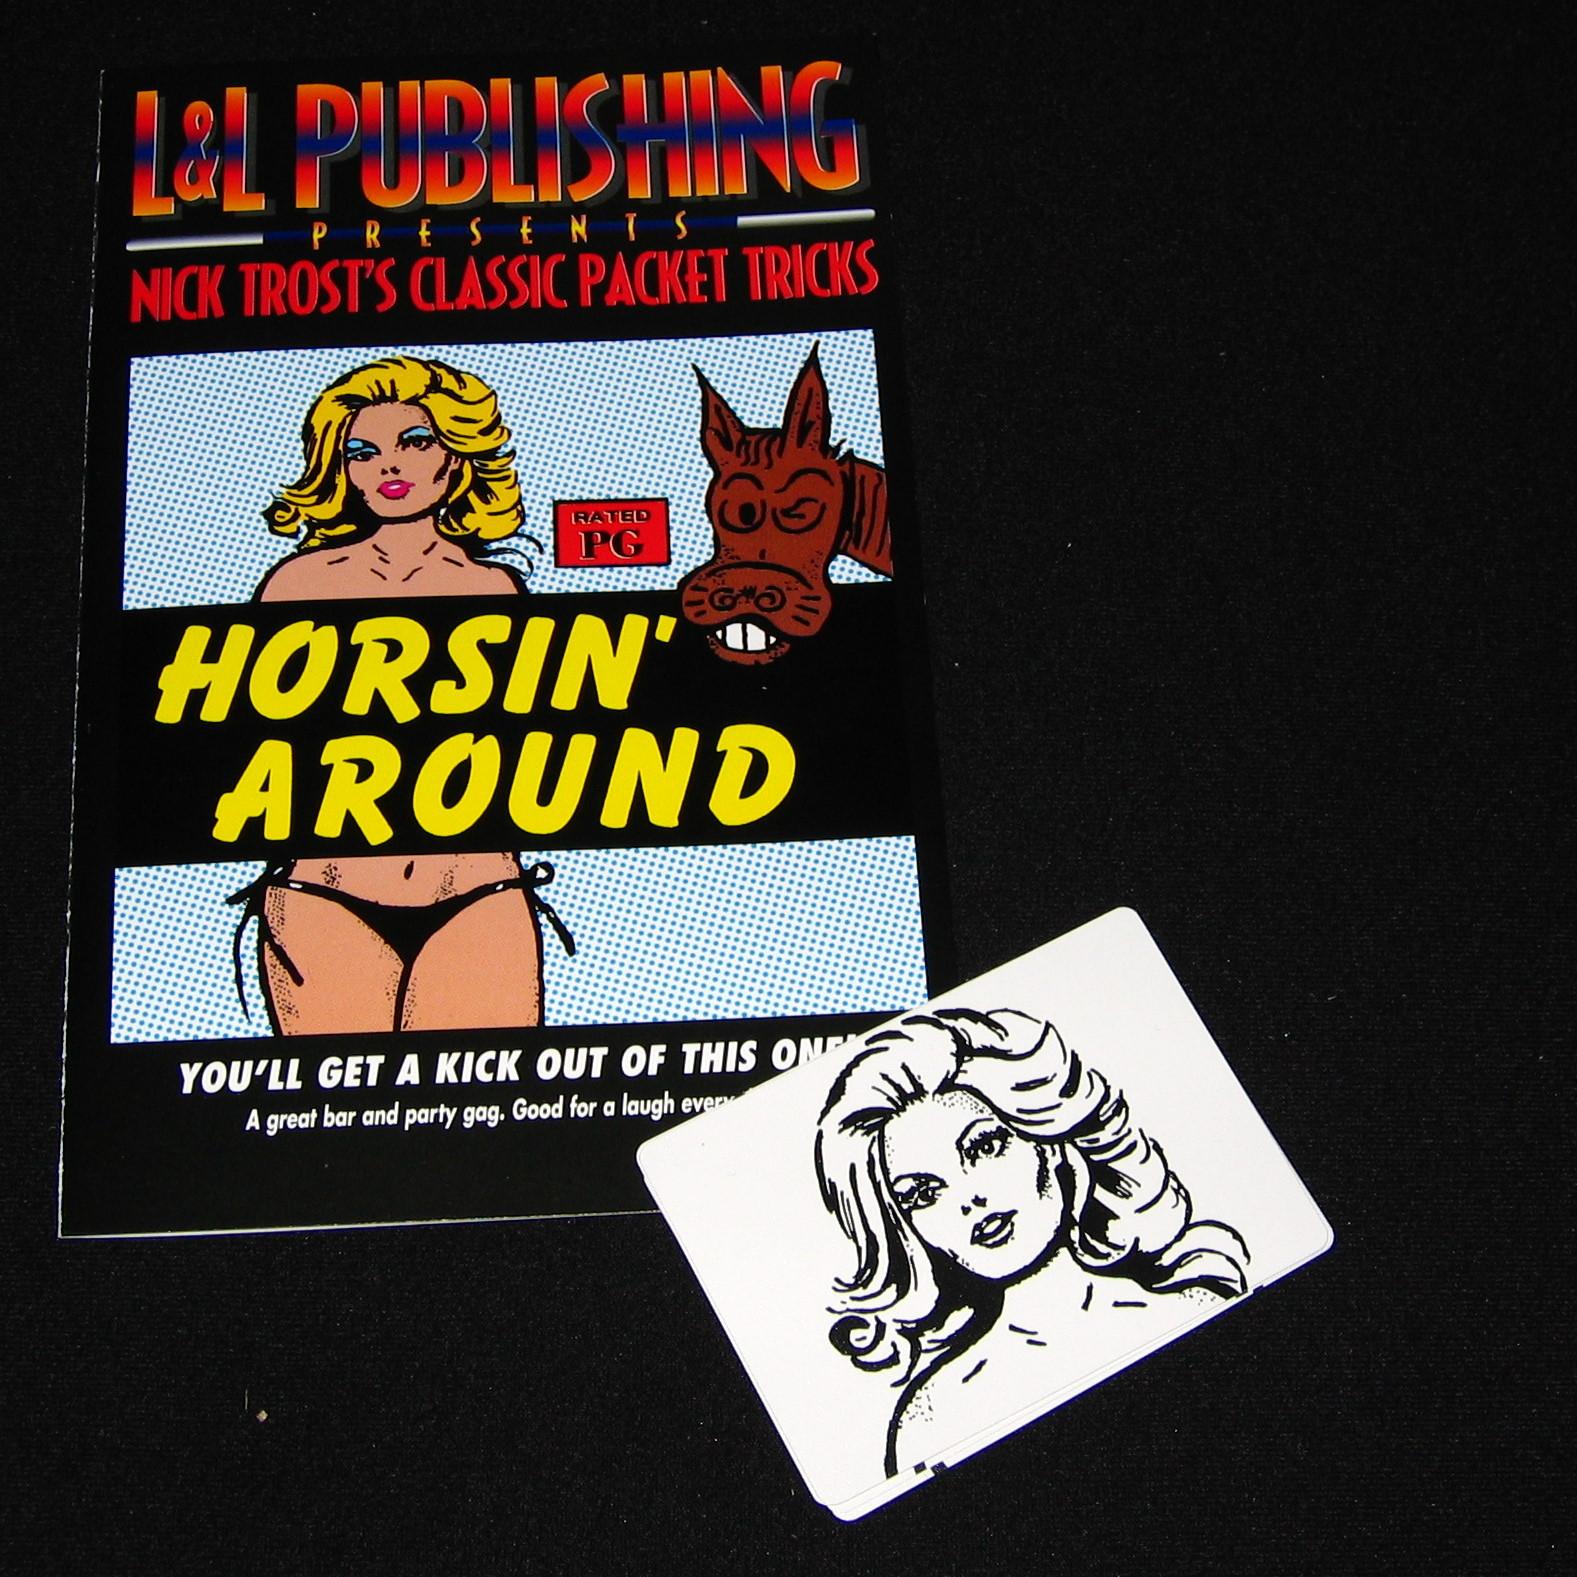 Horsin' Around by Nick Trost